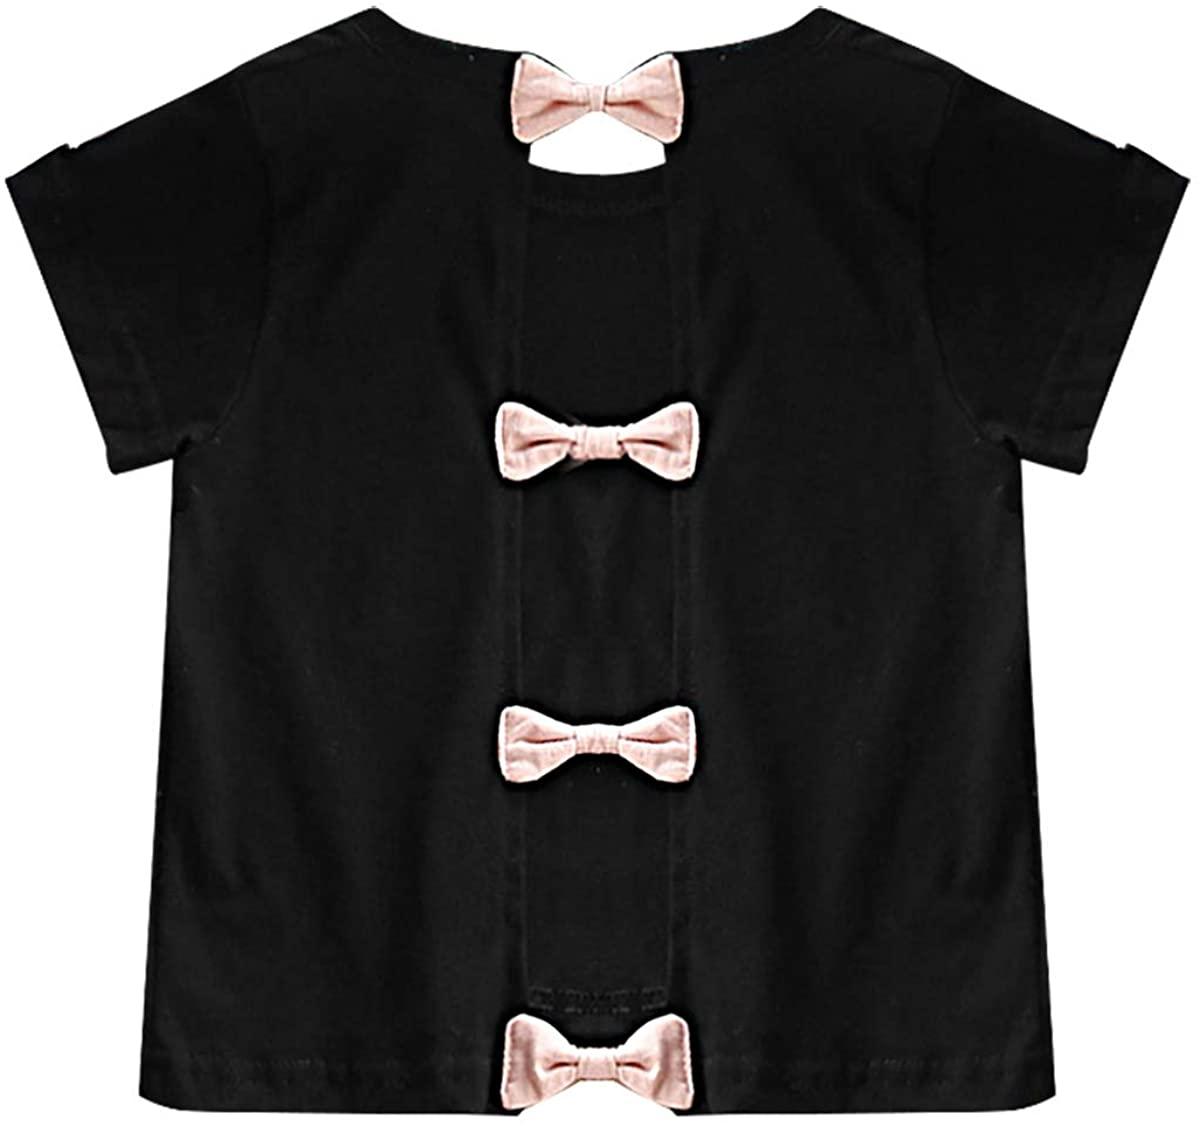 iiniim Trendy Kids Girls Round Neck Bowknots Cotton Short Sleeve T-Shirt Tops for Summer Party Casual Sundress